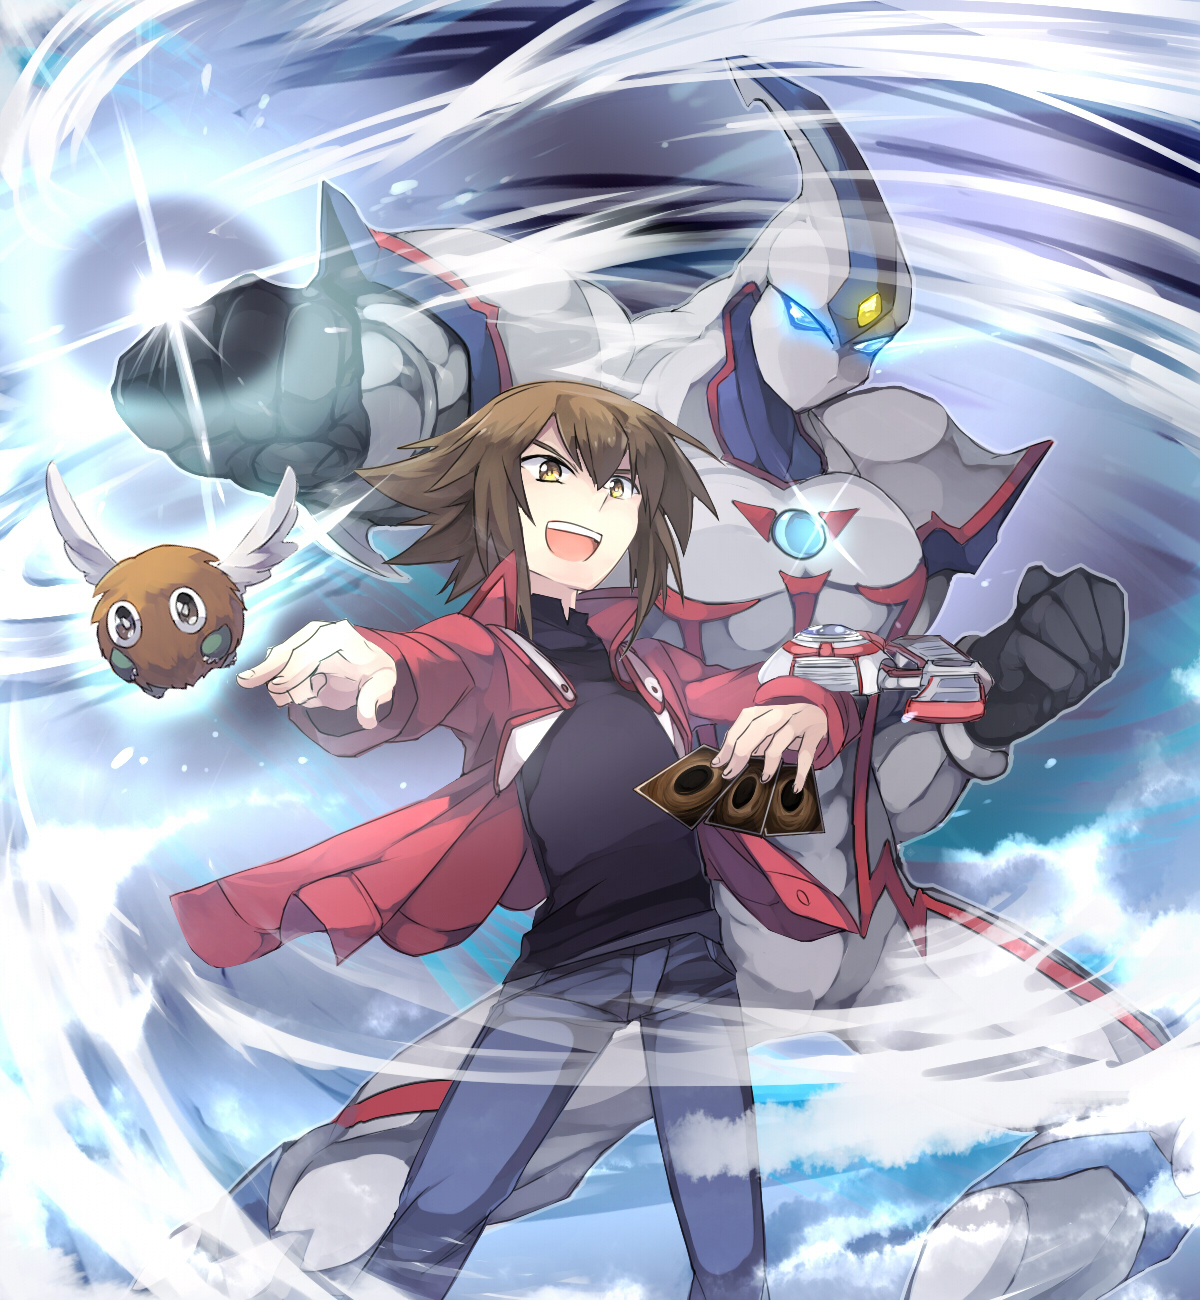 Yugioh Gx Elemental Hero Neos Yu-Gi-Oh! GX/#1710894 ...